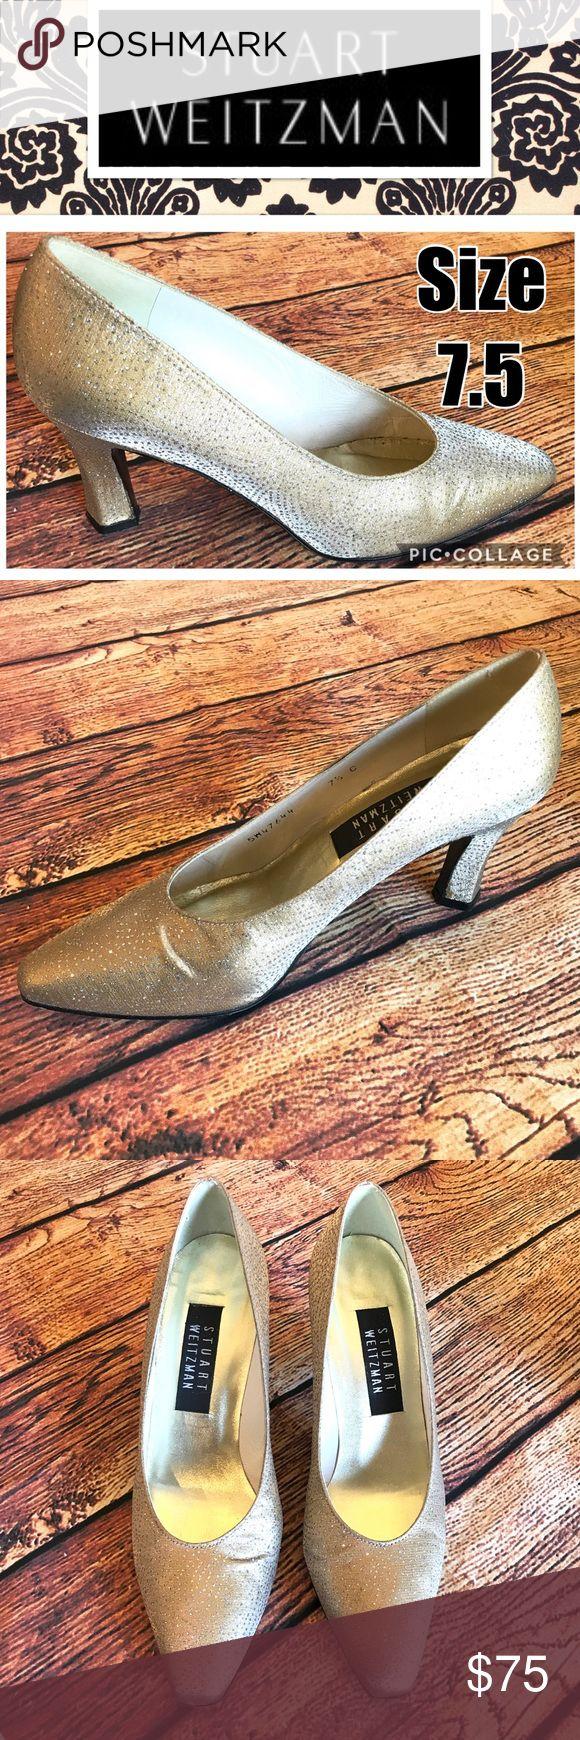 Stuart Wiseman Shimmery Hold Heels Size 7.5 SO pretty! Stuart Weitzman Shoes Heels